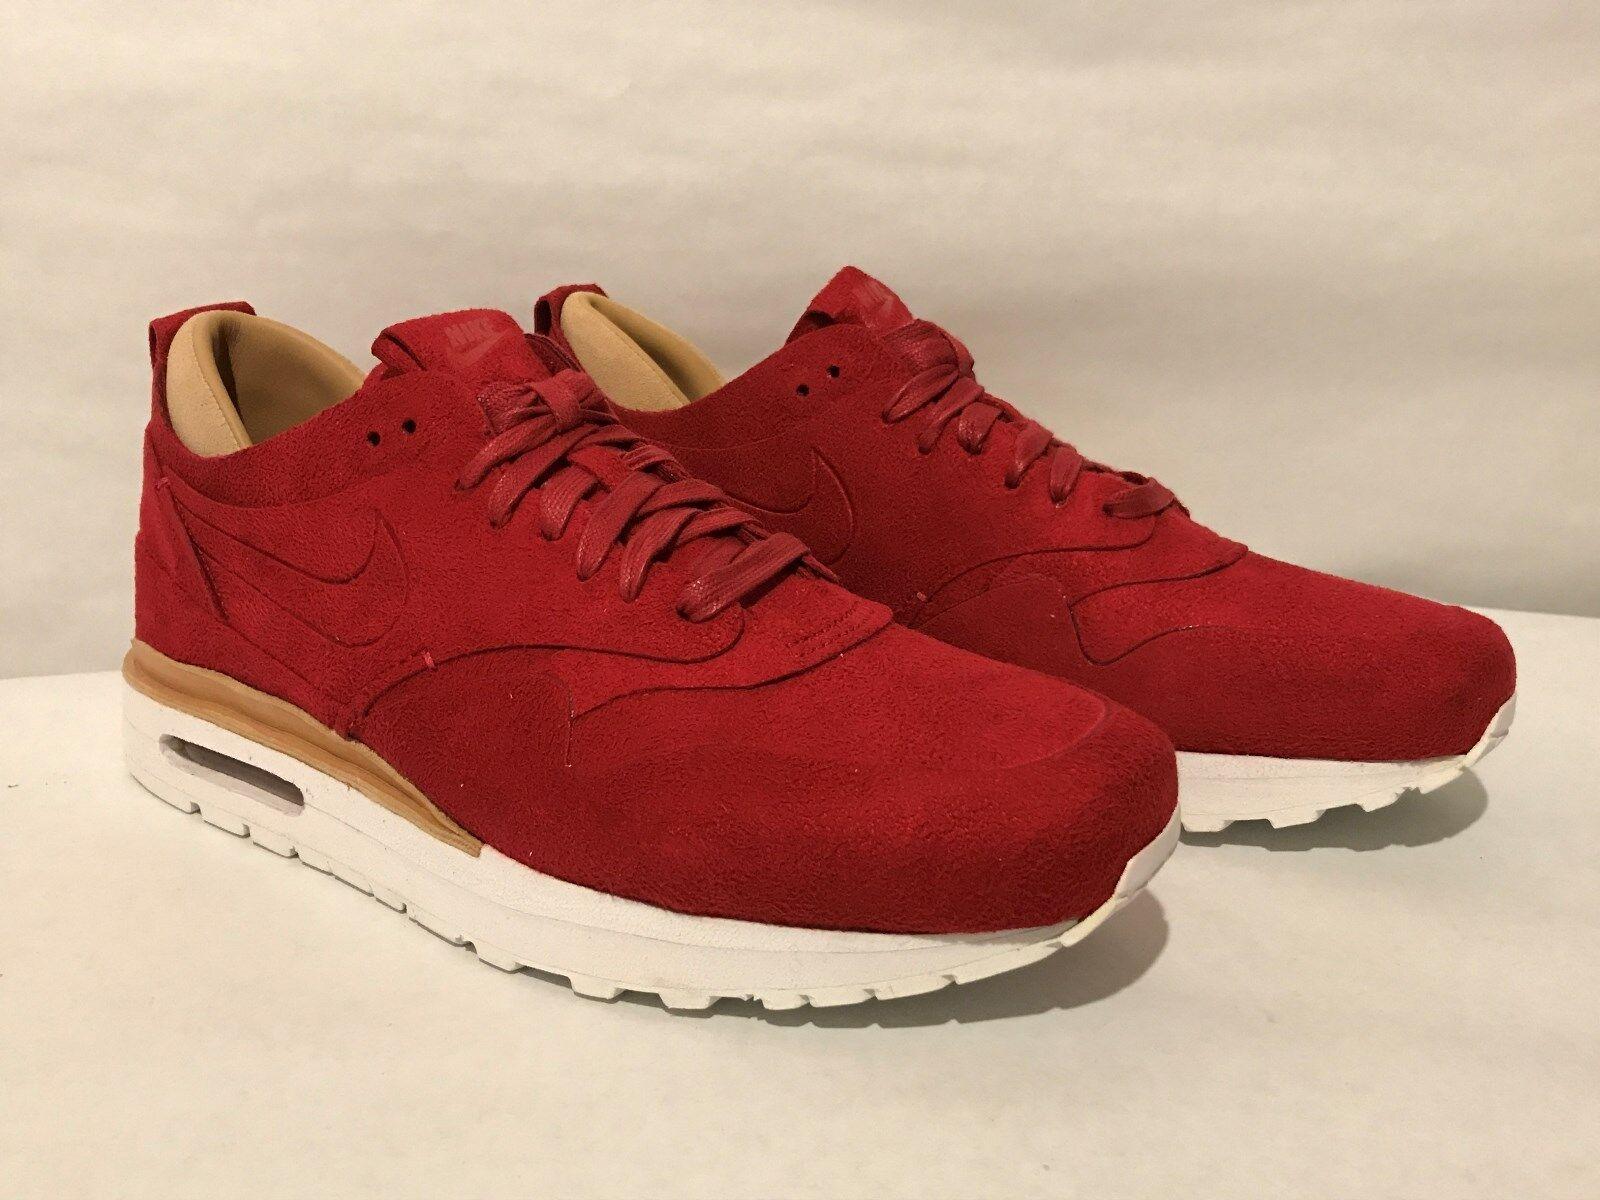 Men's Nike Air Max 1 Royal Running shoes Gym Red New No Box Top 847671-661